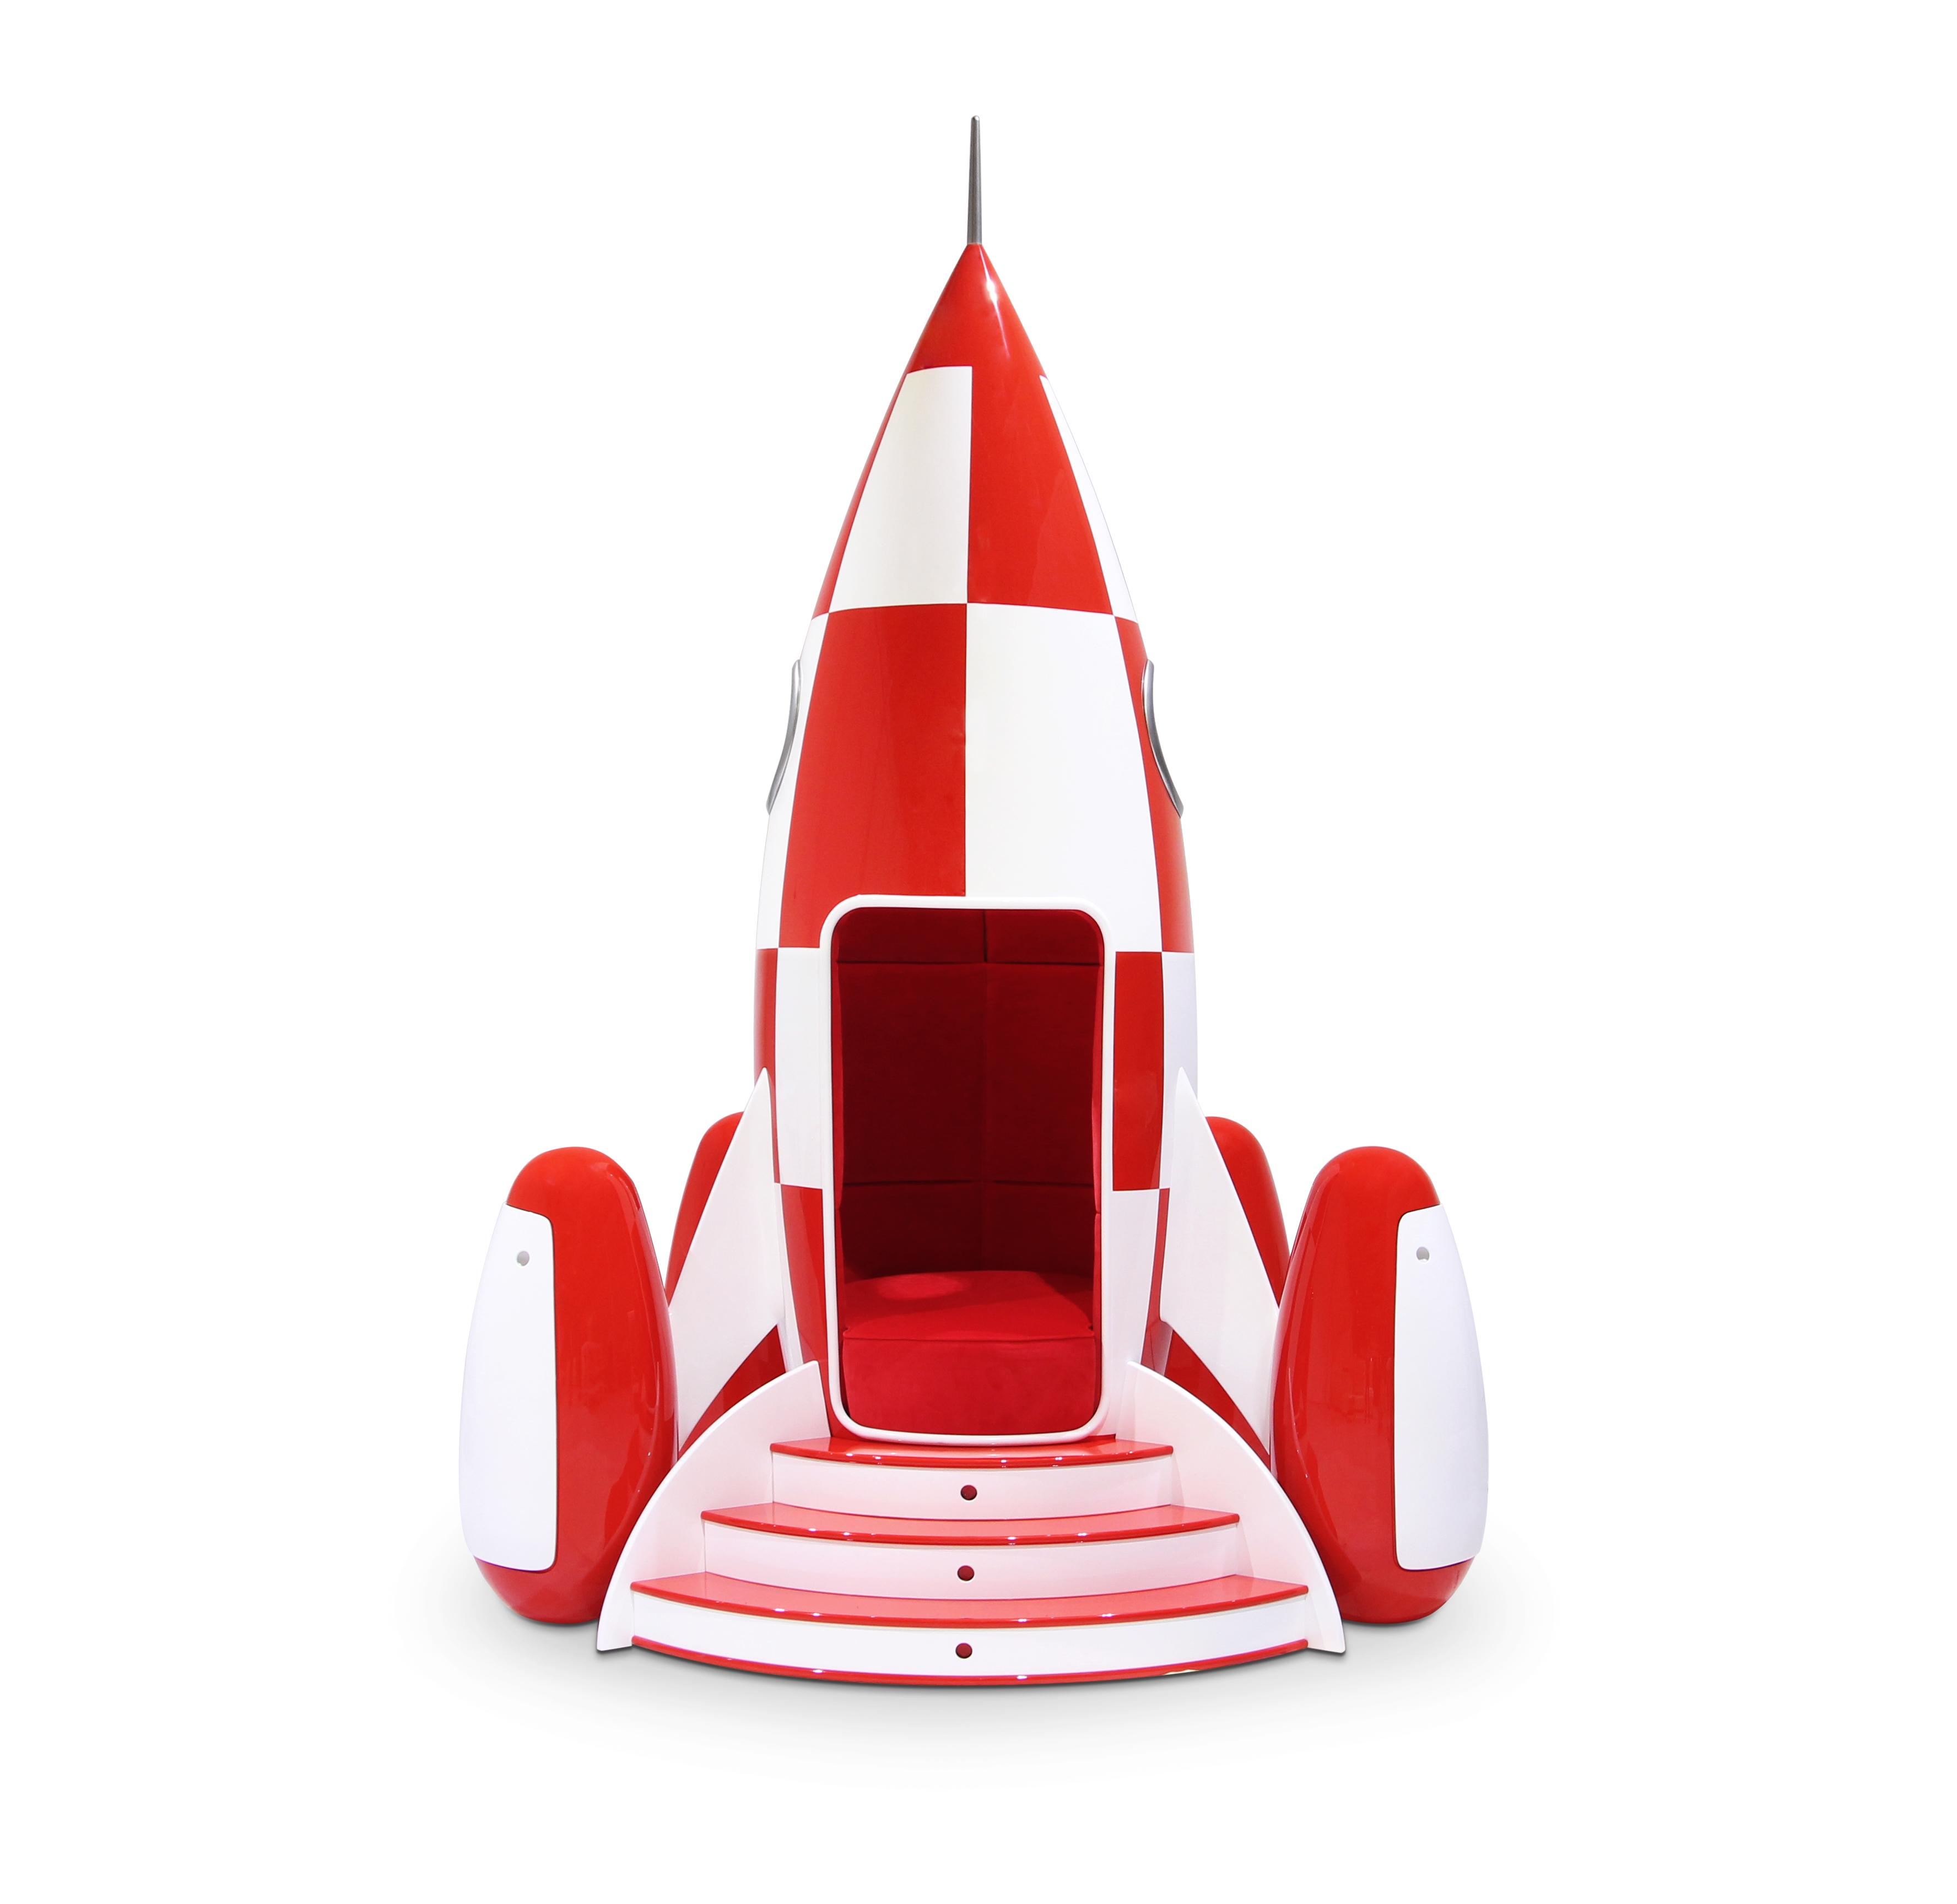 rocky-rocket-detail-03-circu-magical-furniture-jpg